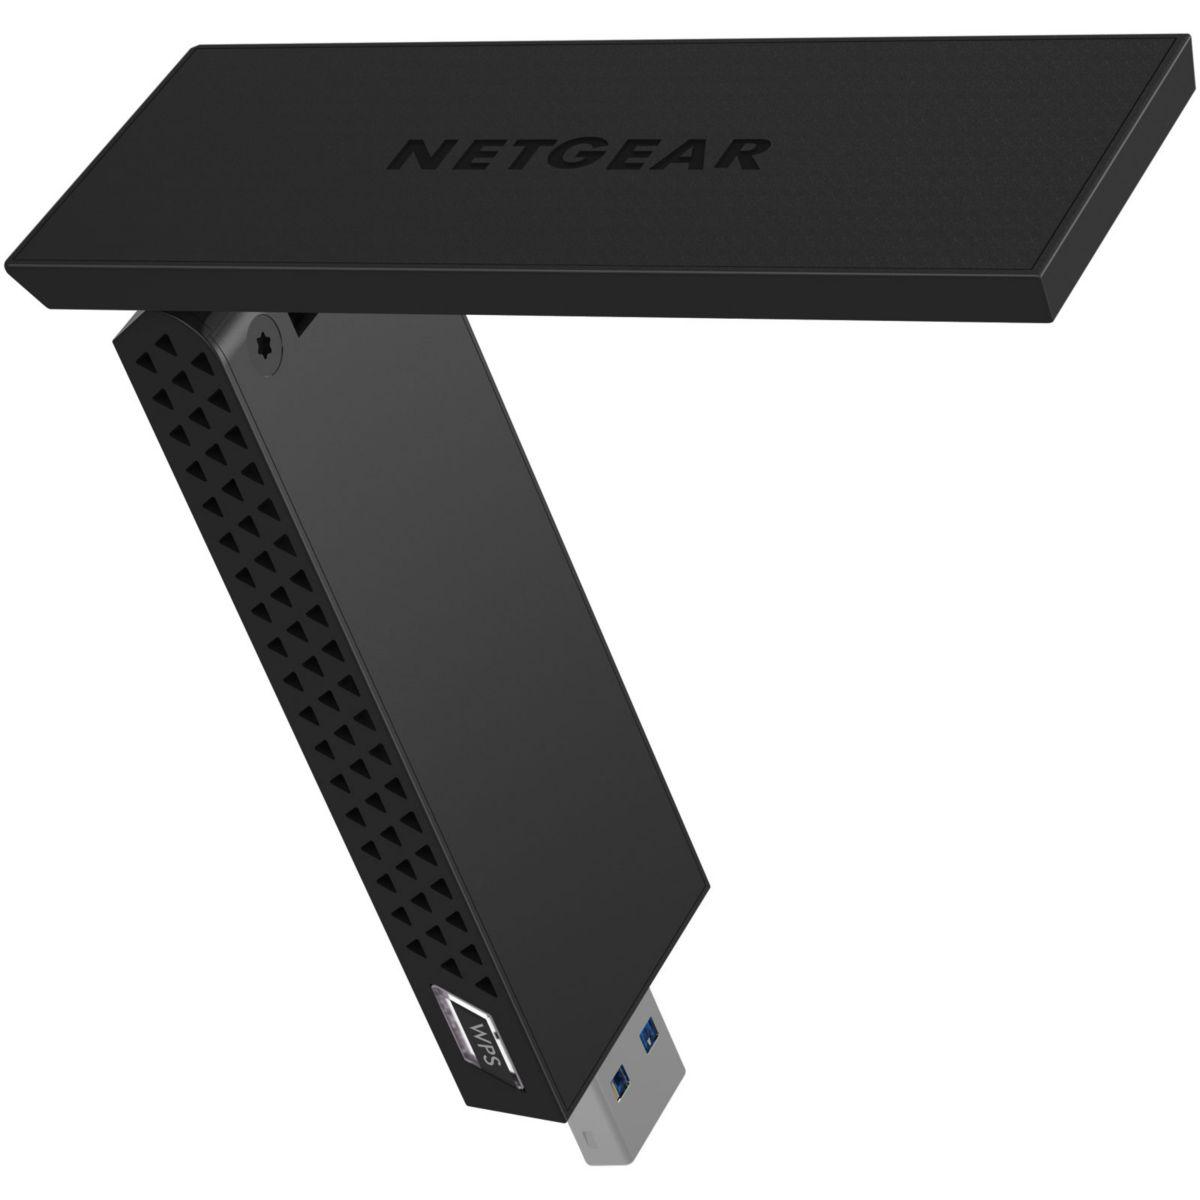 Adaptateur réseau NETGEAR Wifi AC1200 USB 3.0 (photo)